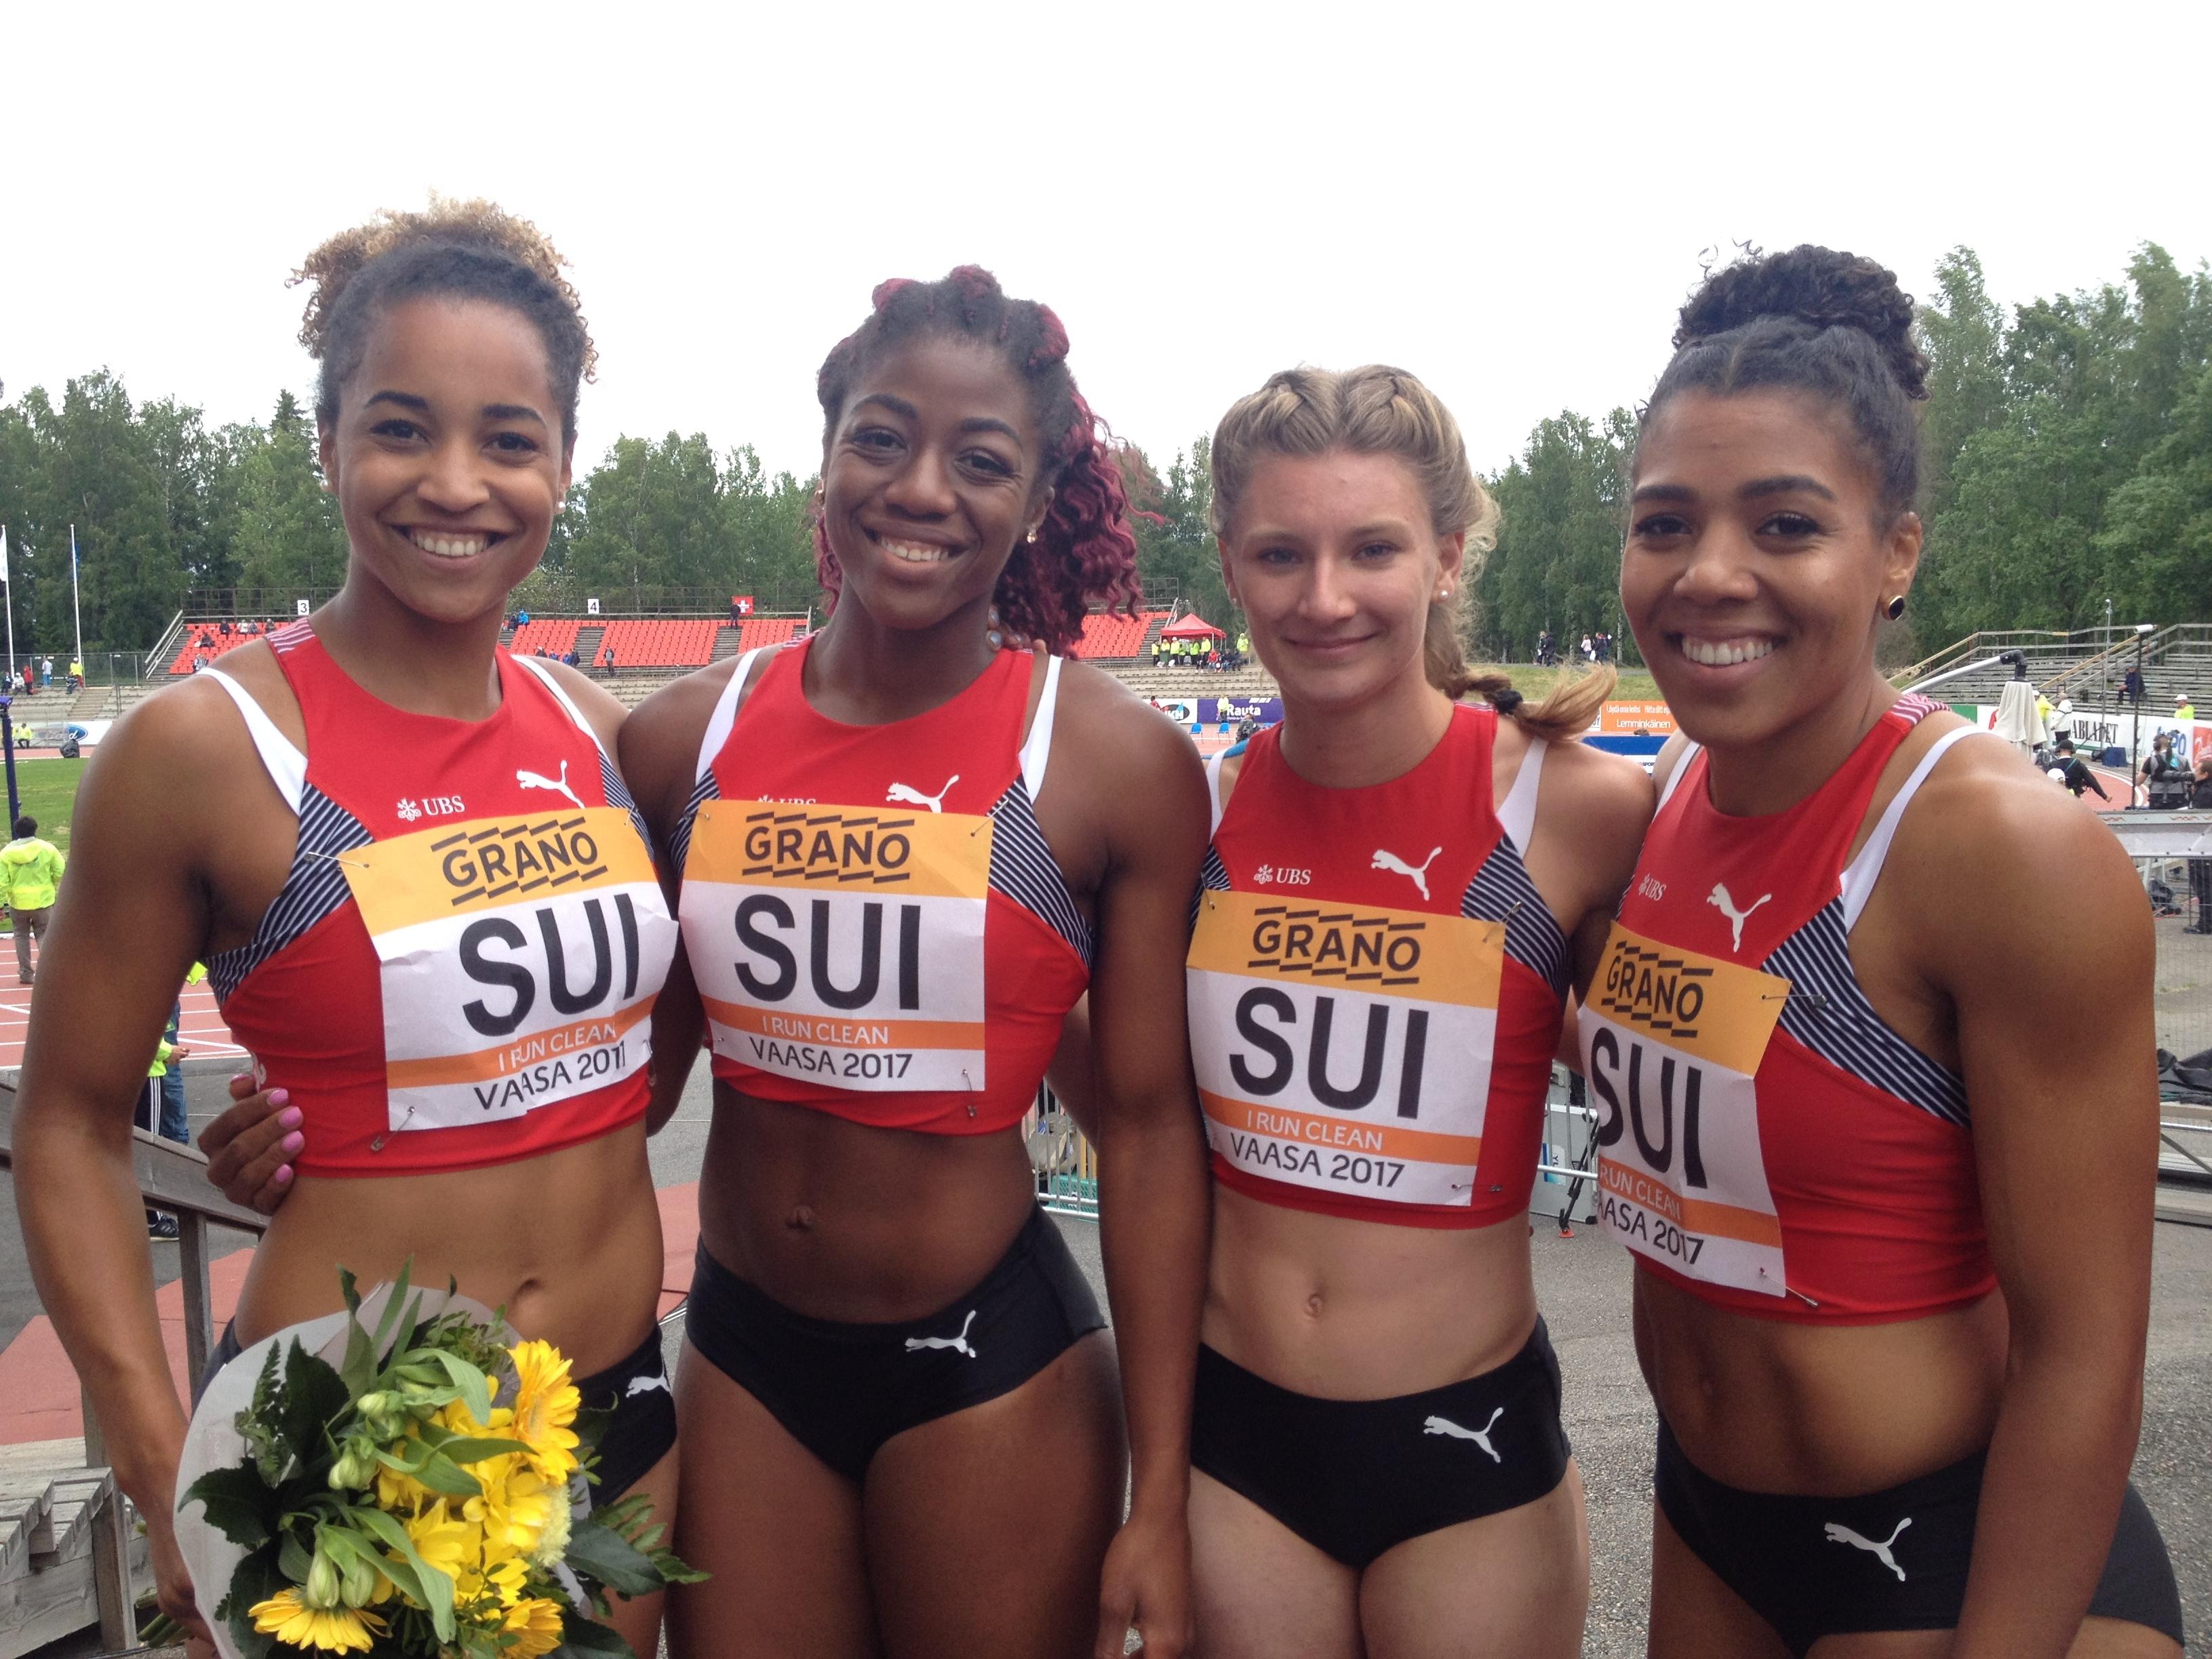 Salomé Kora, Samantha Dagry, Ajla Del Ponte, Mujinga Kambundji (Photo: Swiss Athletics)